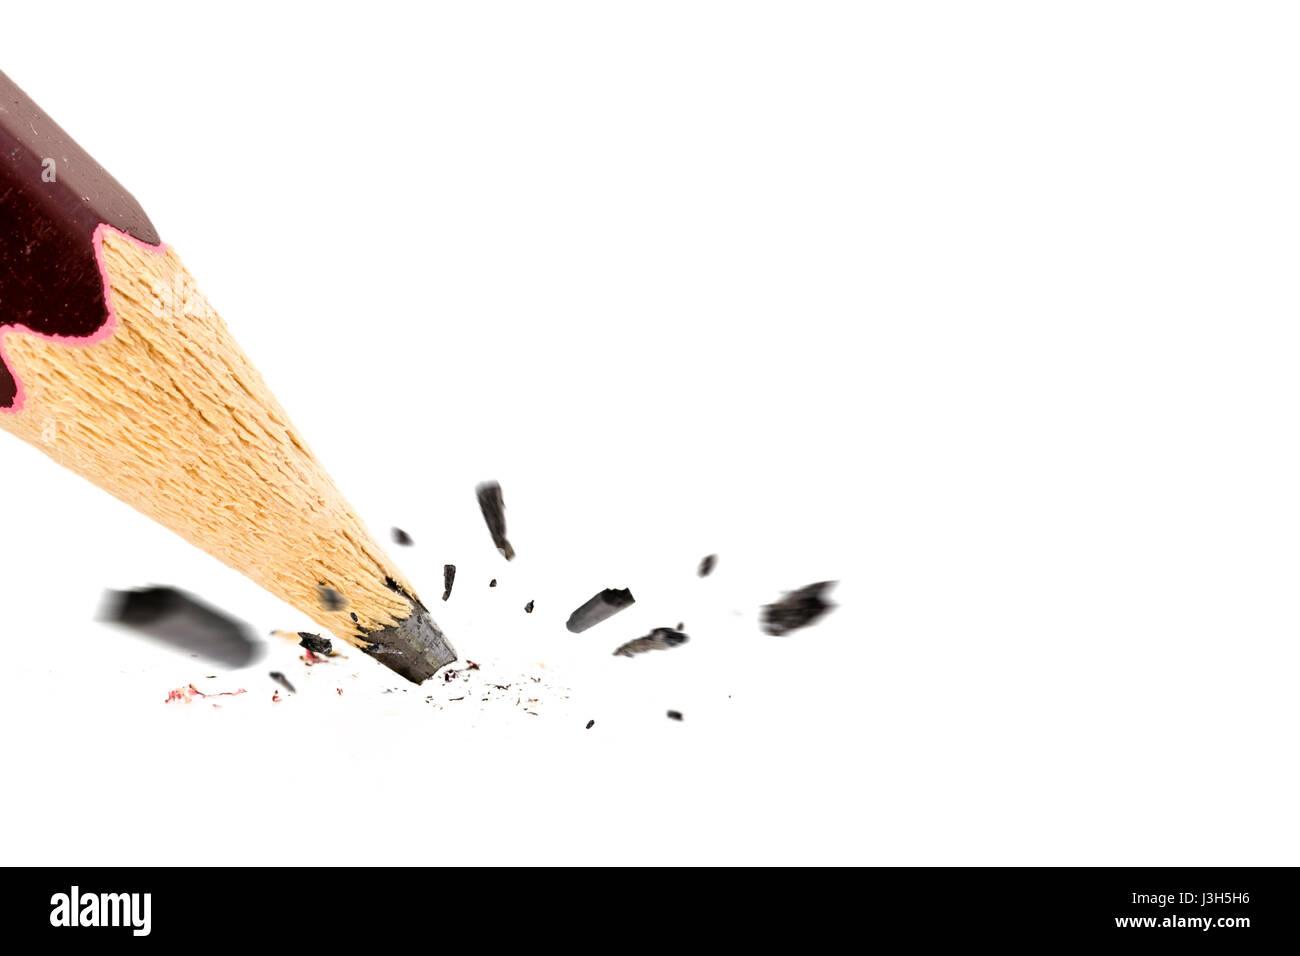 Close up of broken pencil. Mistake or error concept Stock Photo